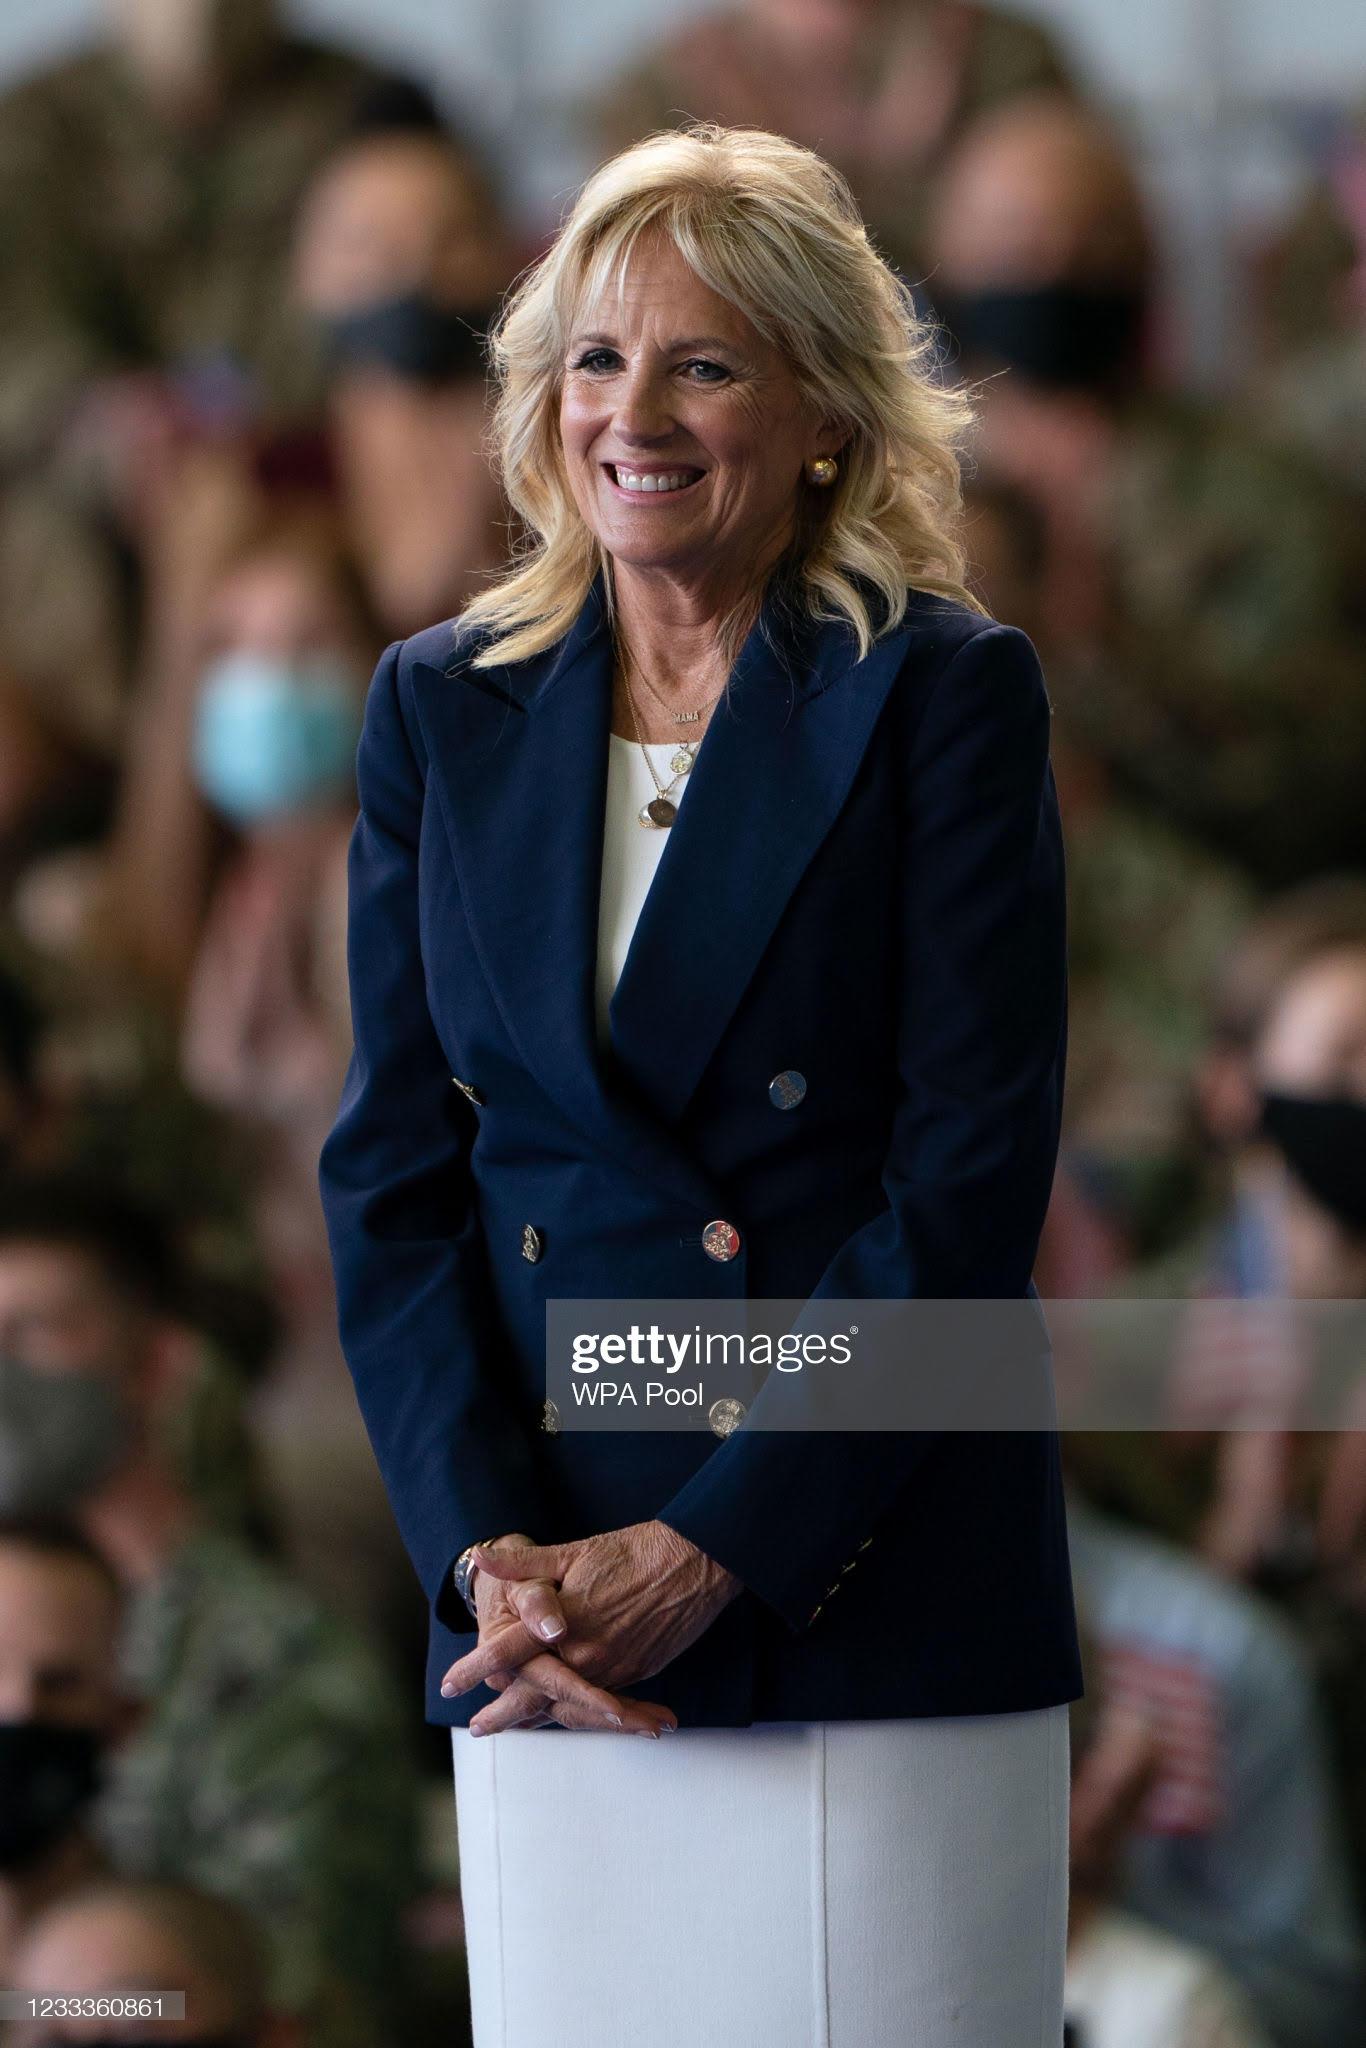 first-lady-dr-jill-biden-wore-michael-kors-collection-raf-mildenhall-in-suffolk-uk